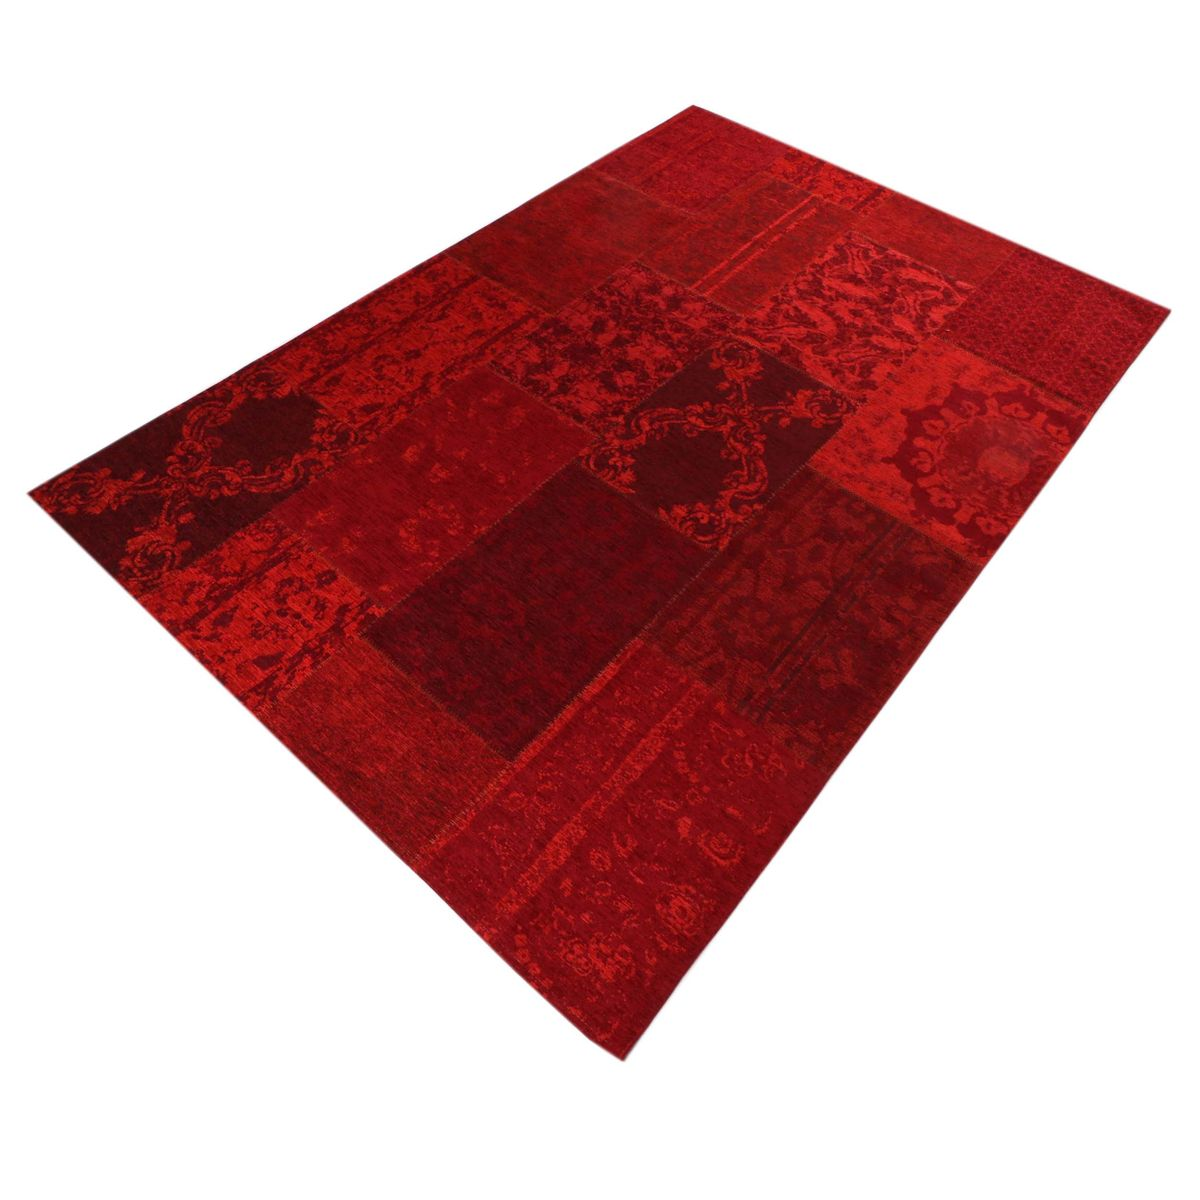 Flachgewebe Teppich Antika Patch Mix